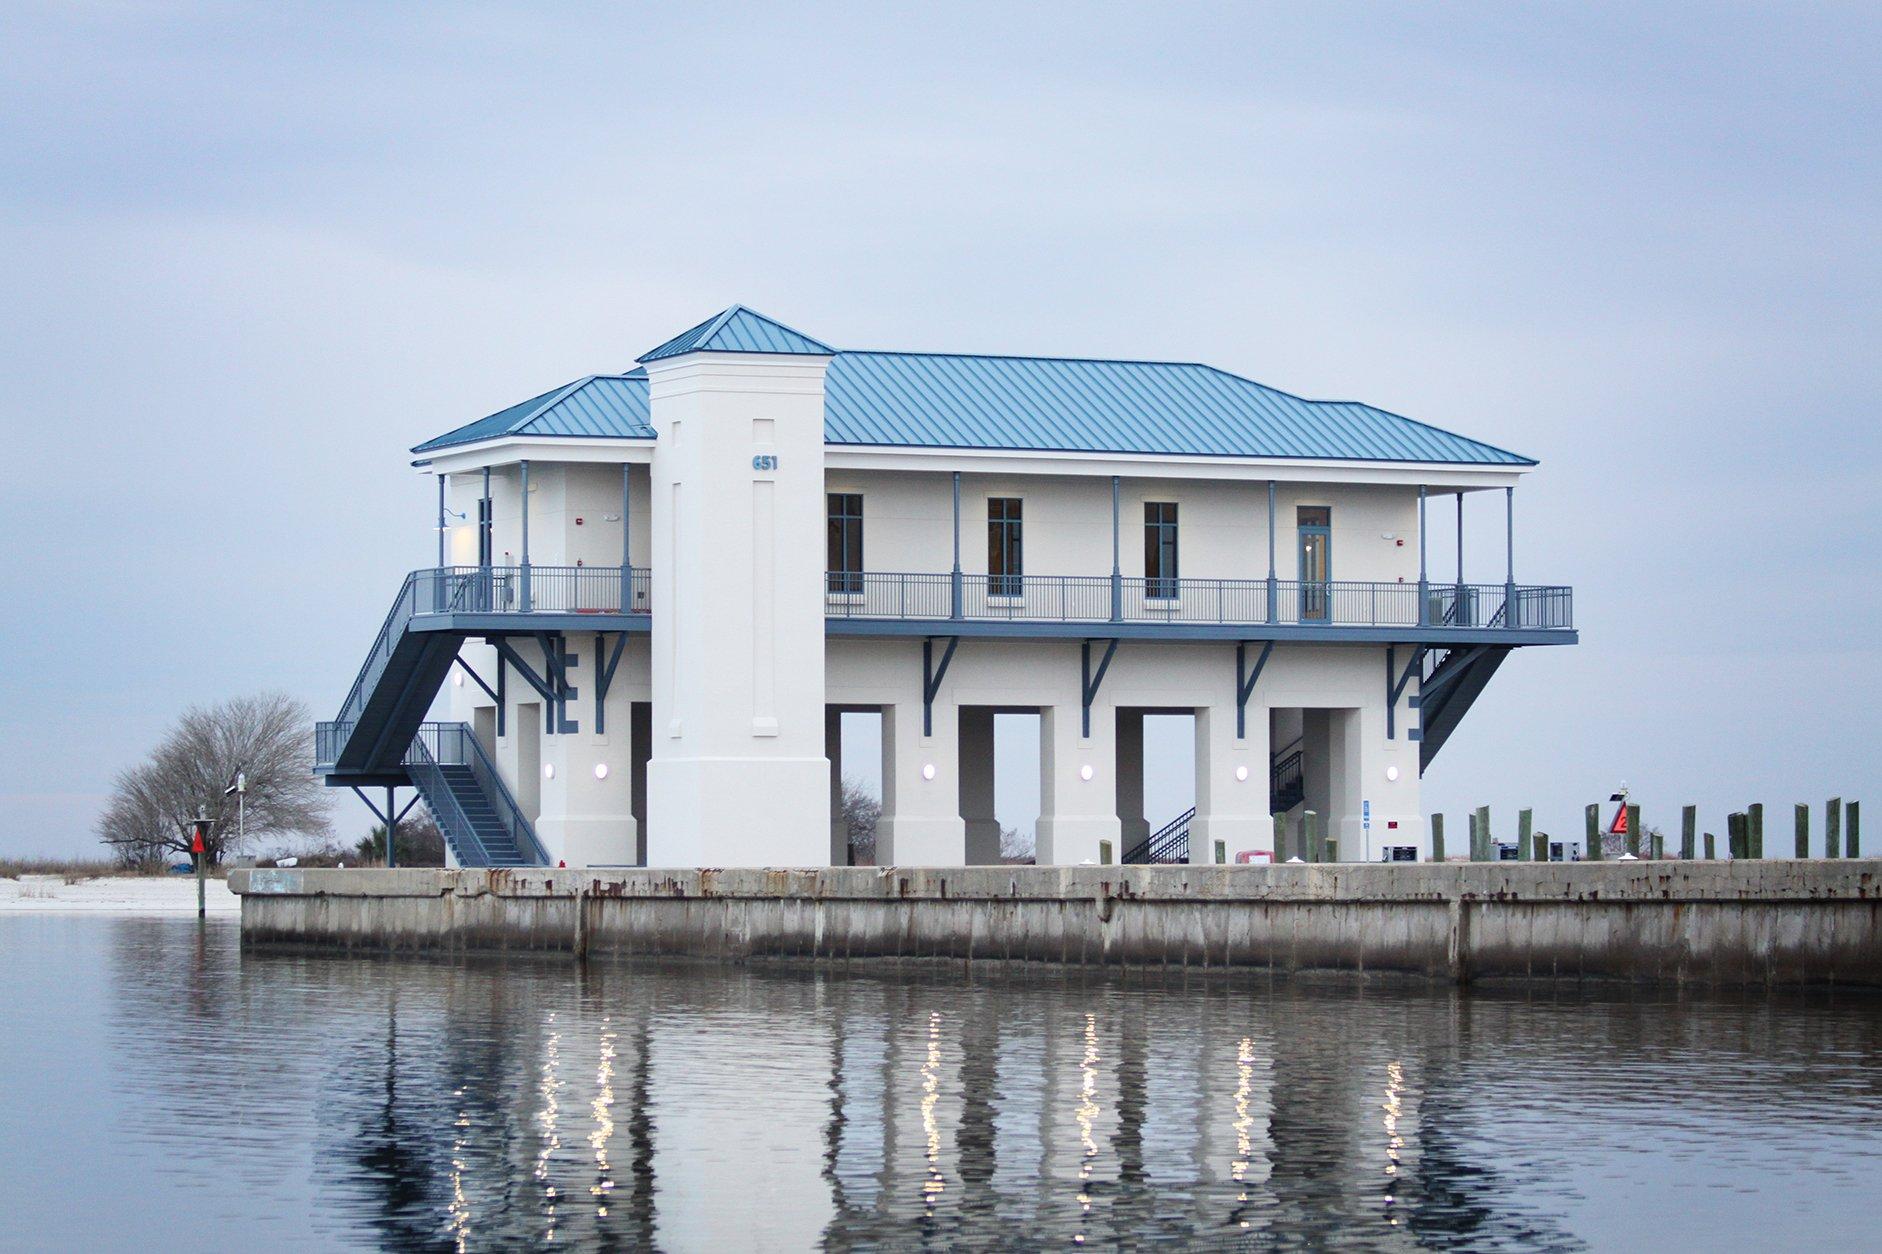 Bait and Fuel at Biloxi Small Craft Harbor